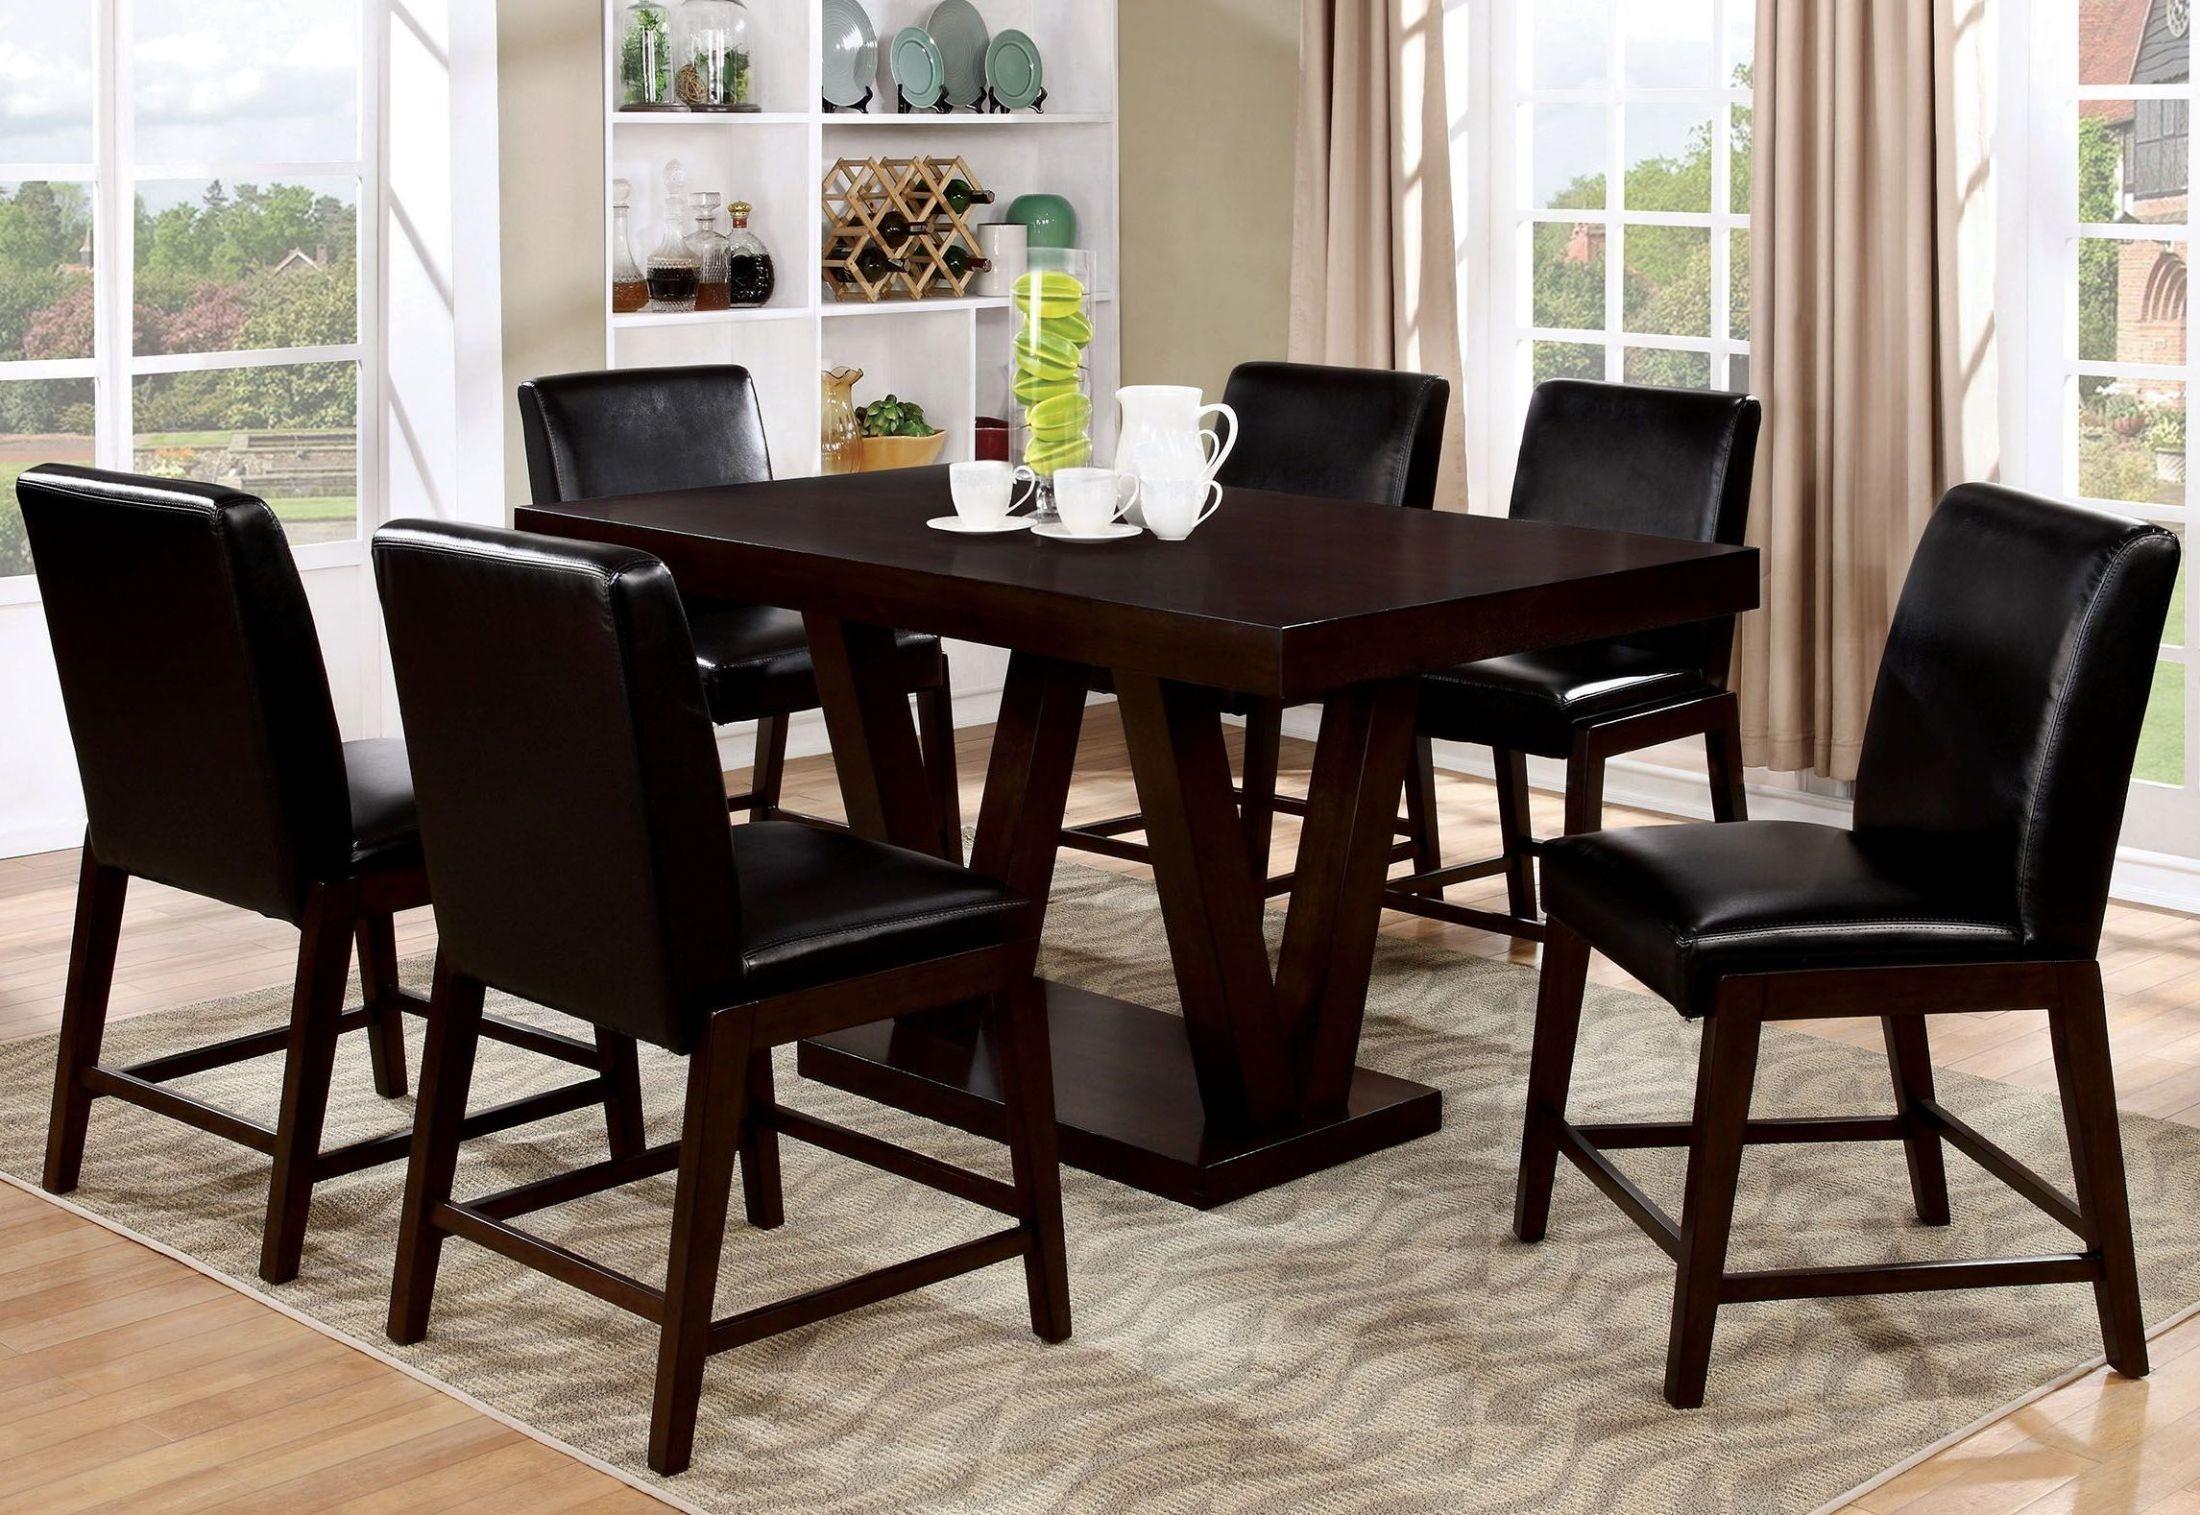 Counter Height Espresso Table : Belinda Ii Espresso Counter Height Table, CM3357PT, Furniture of ...